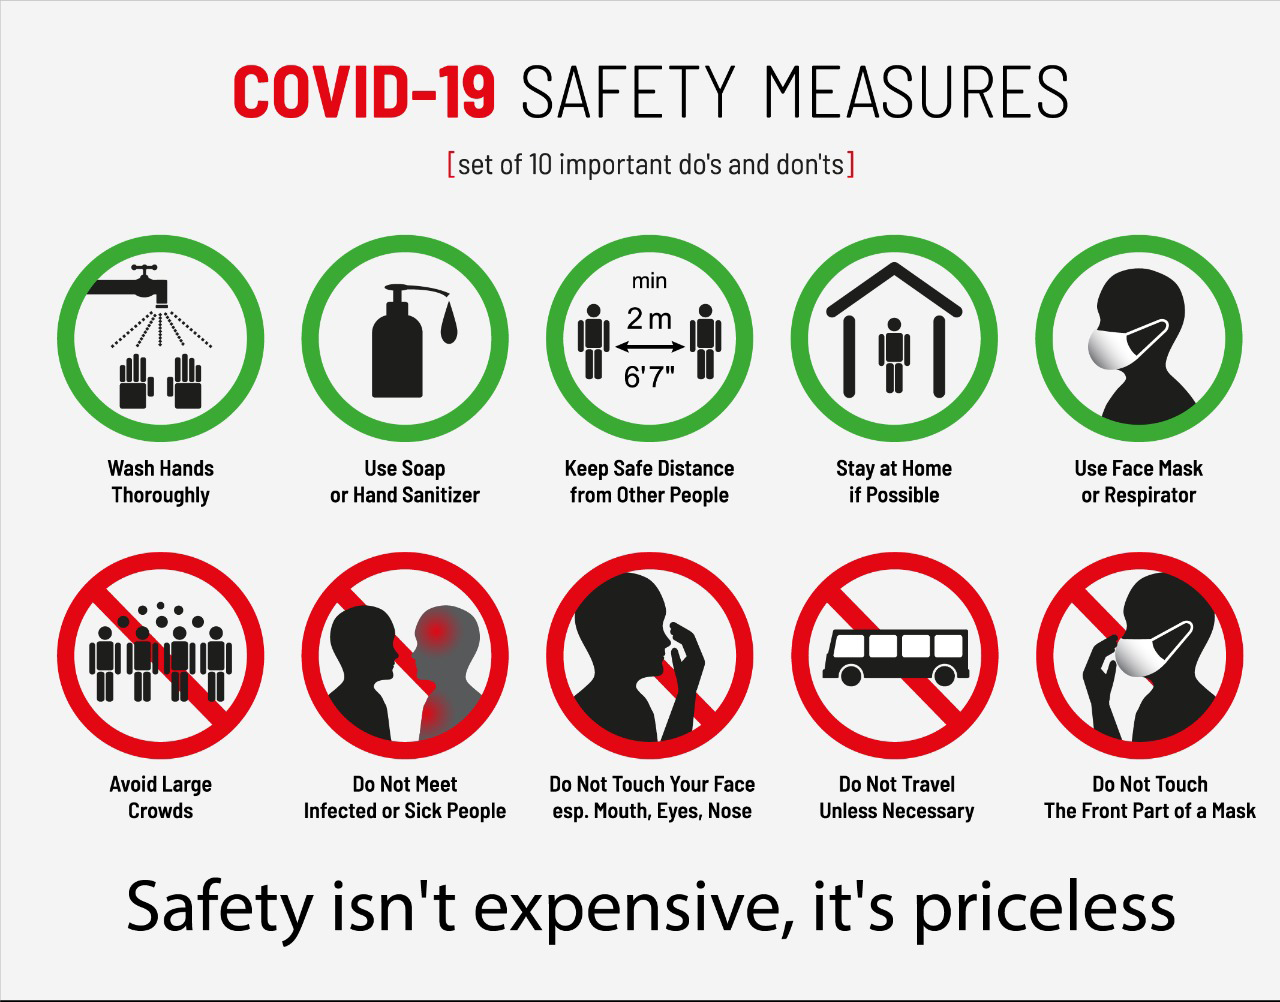 covid 19 safty - Covid-19 Safety